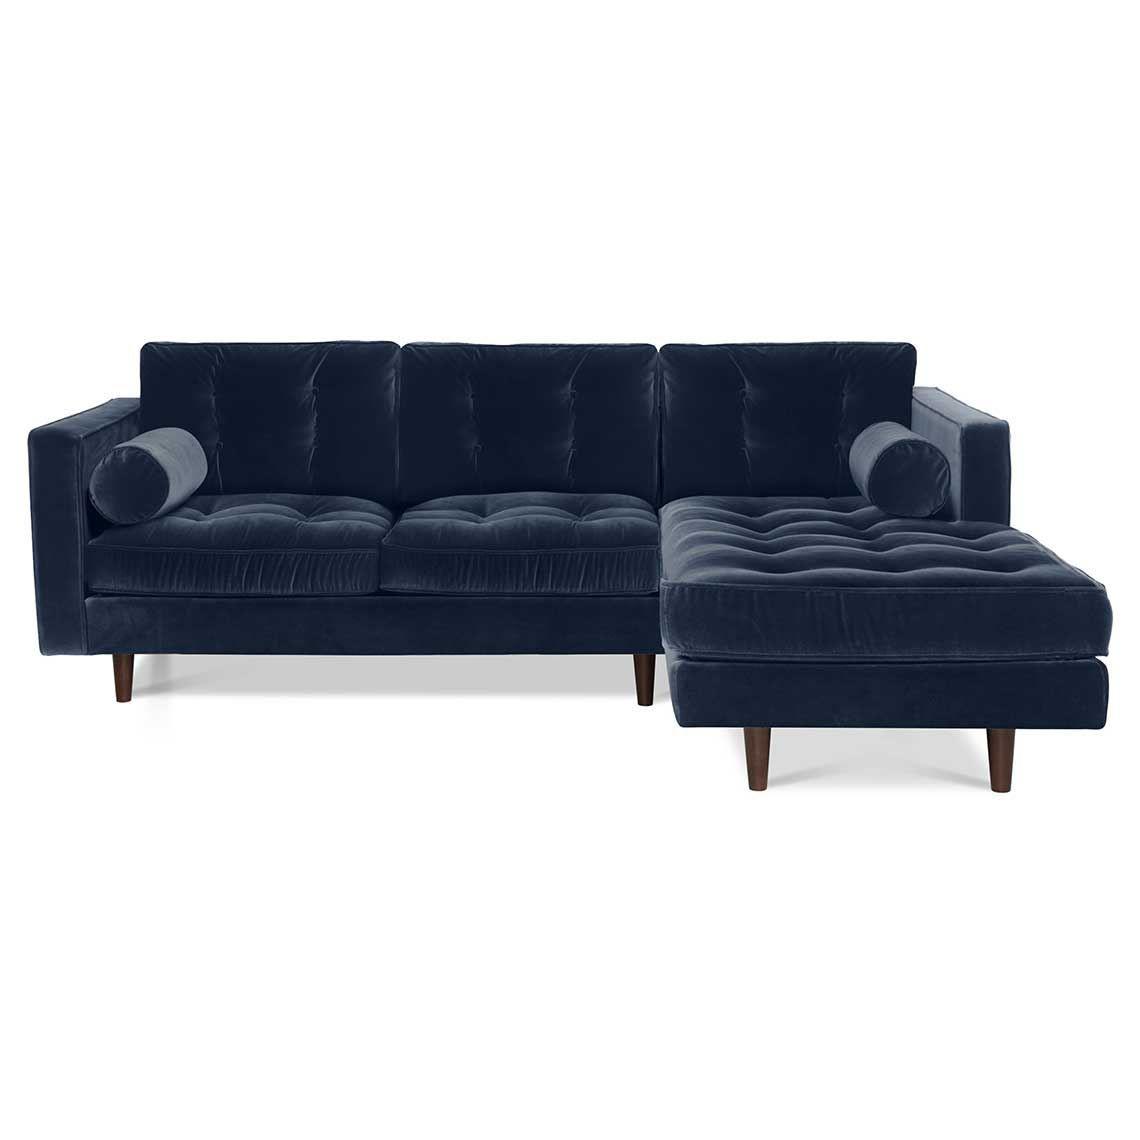 Copenhagen 2 Seat Velvet Modular Sofa With Right Chaise